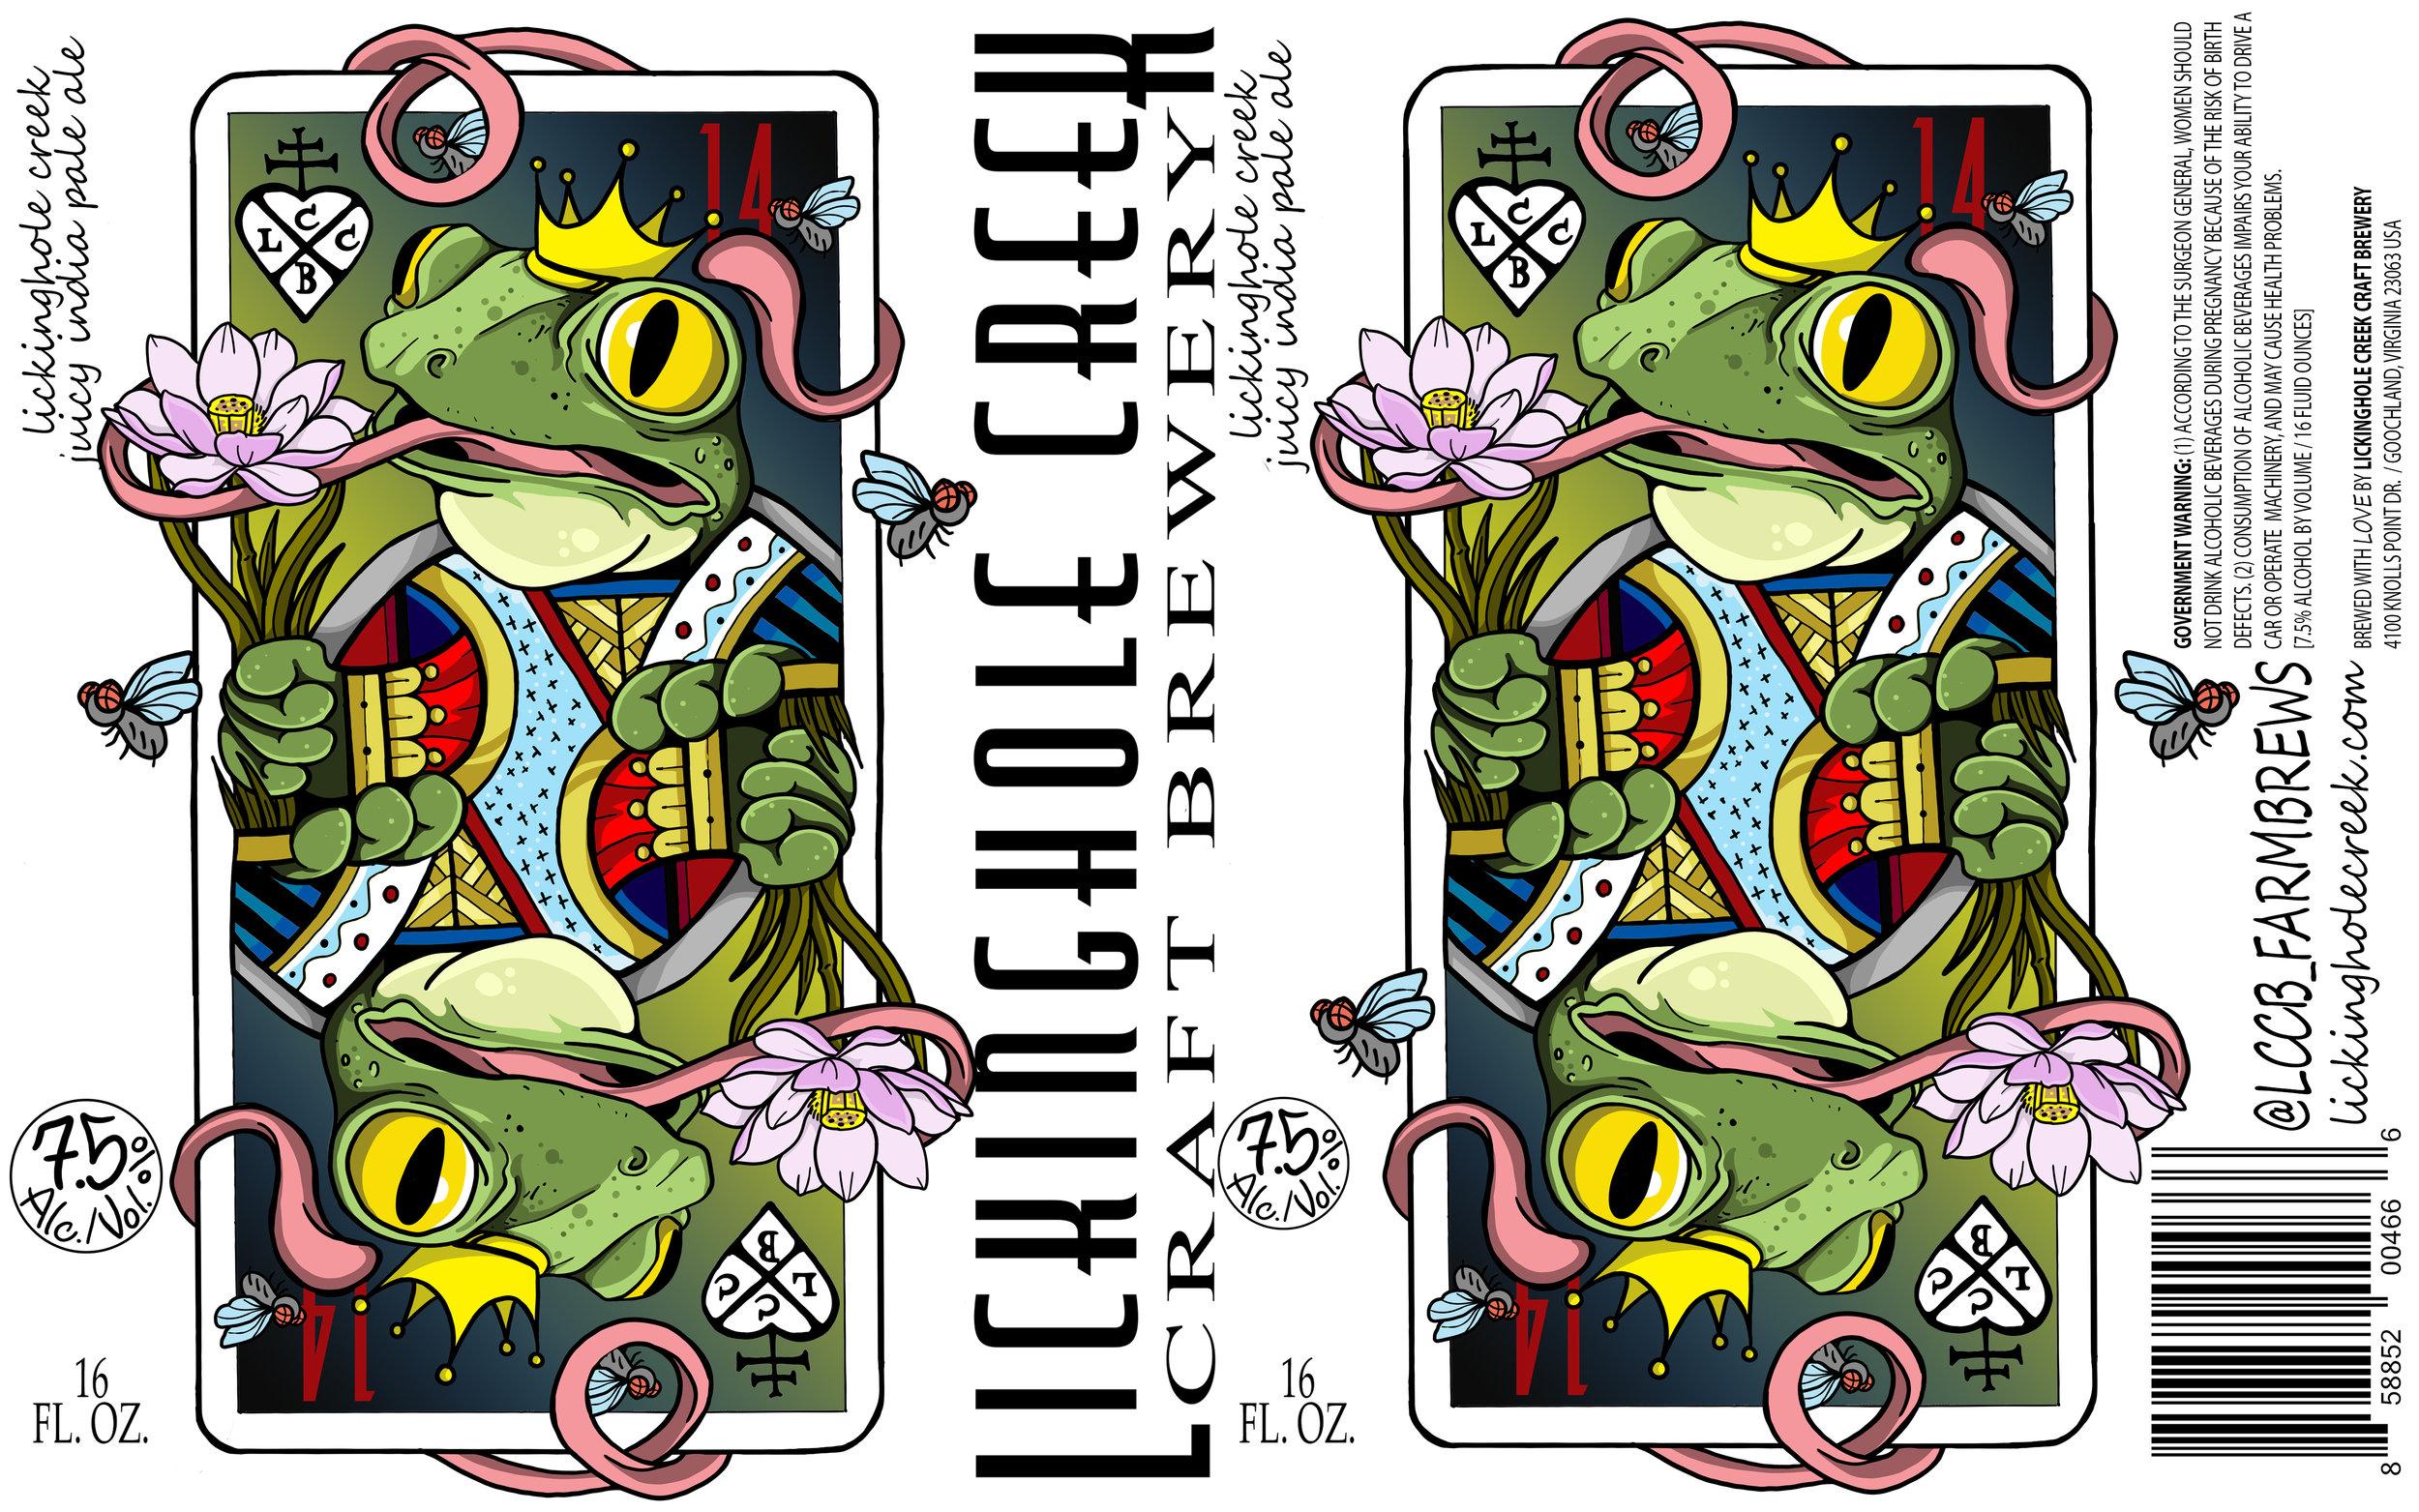 frogfinal.jpg